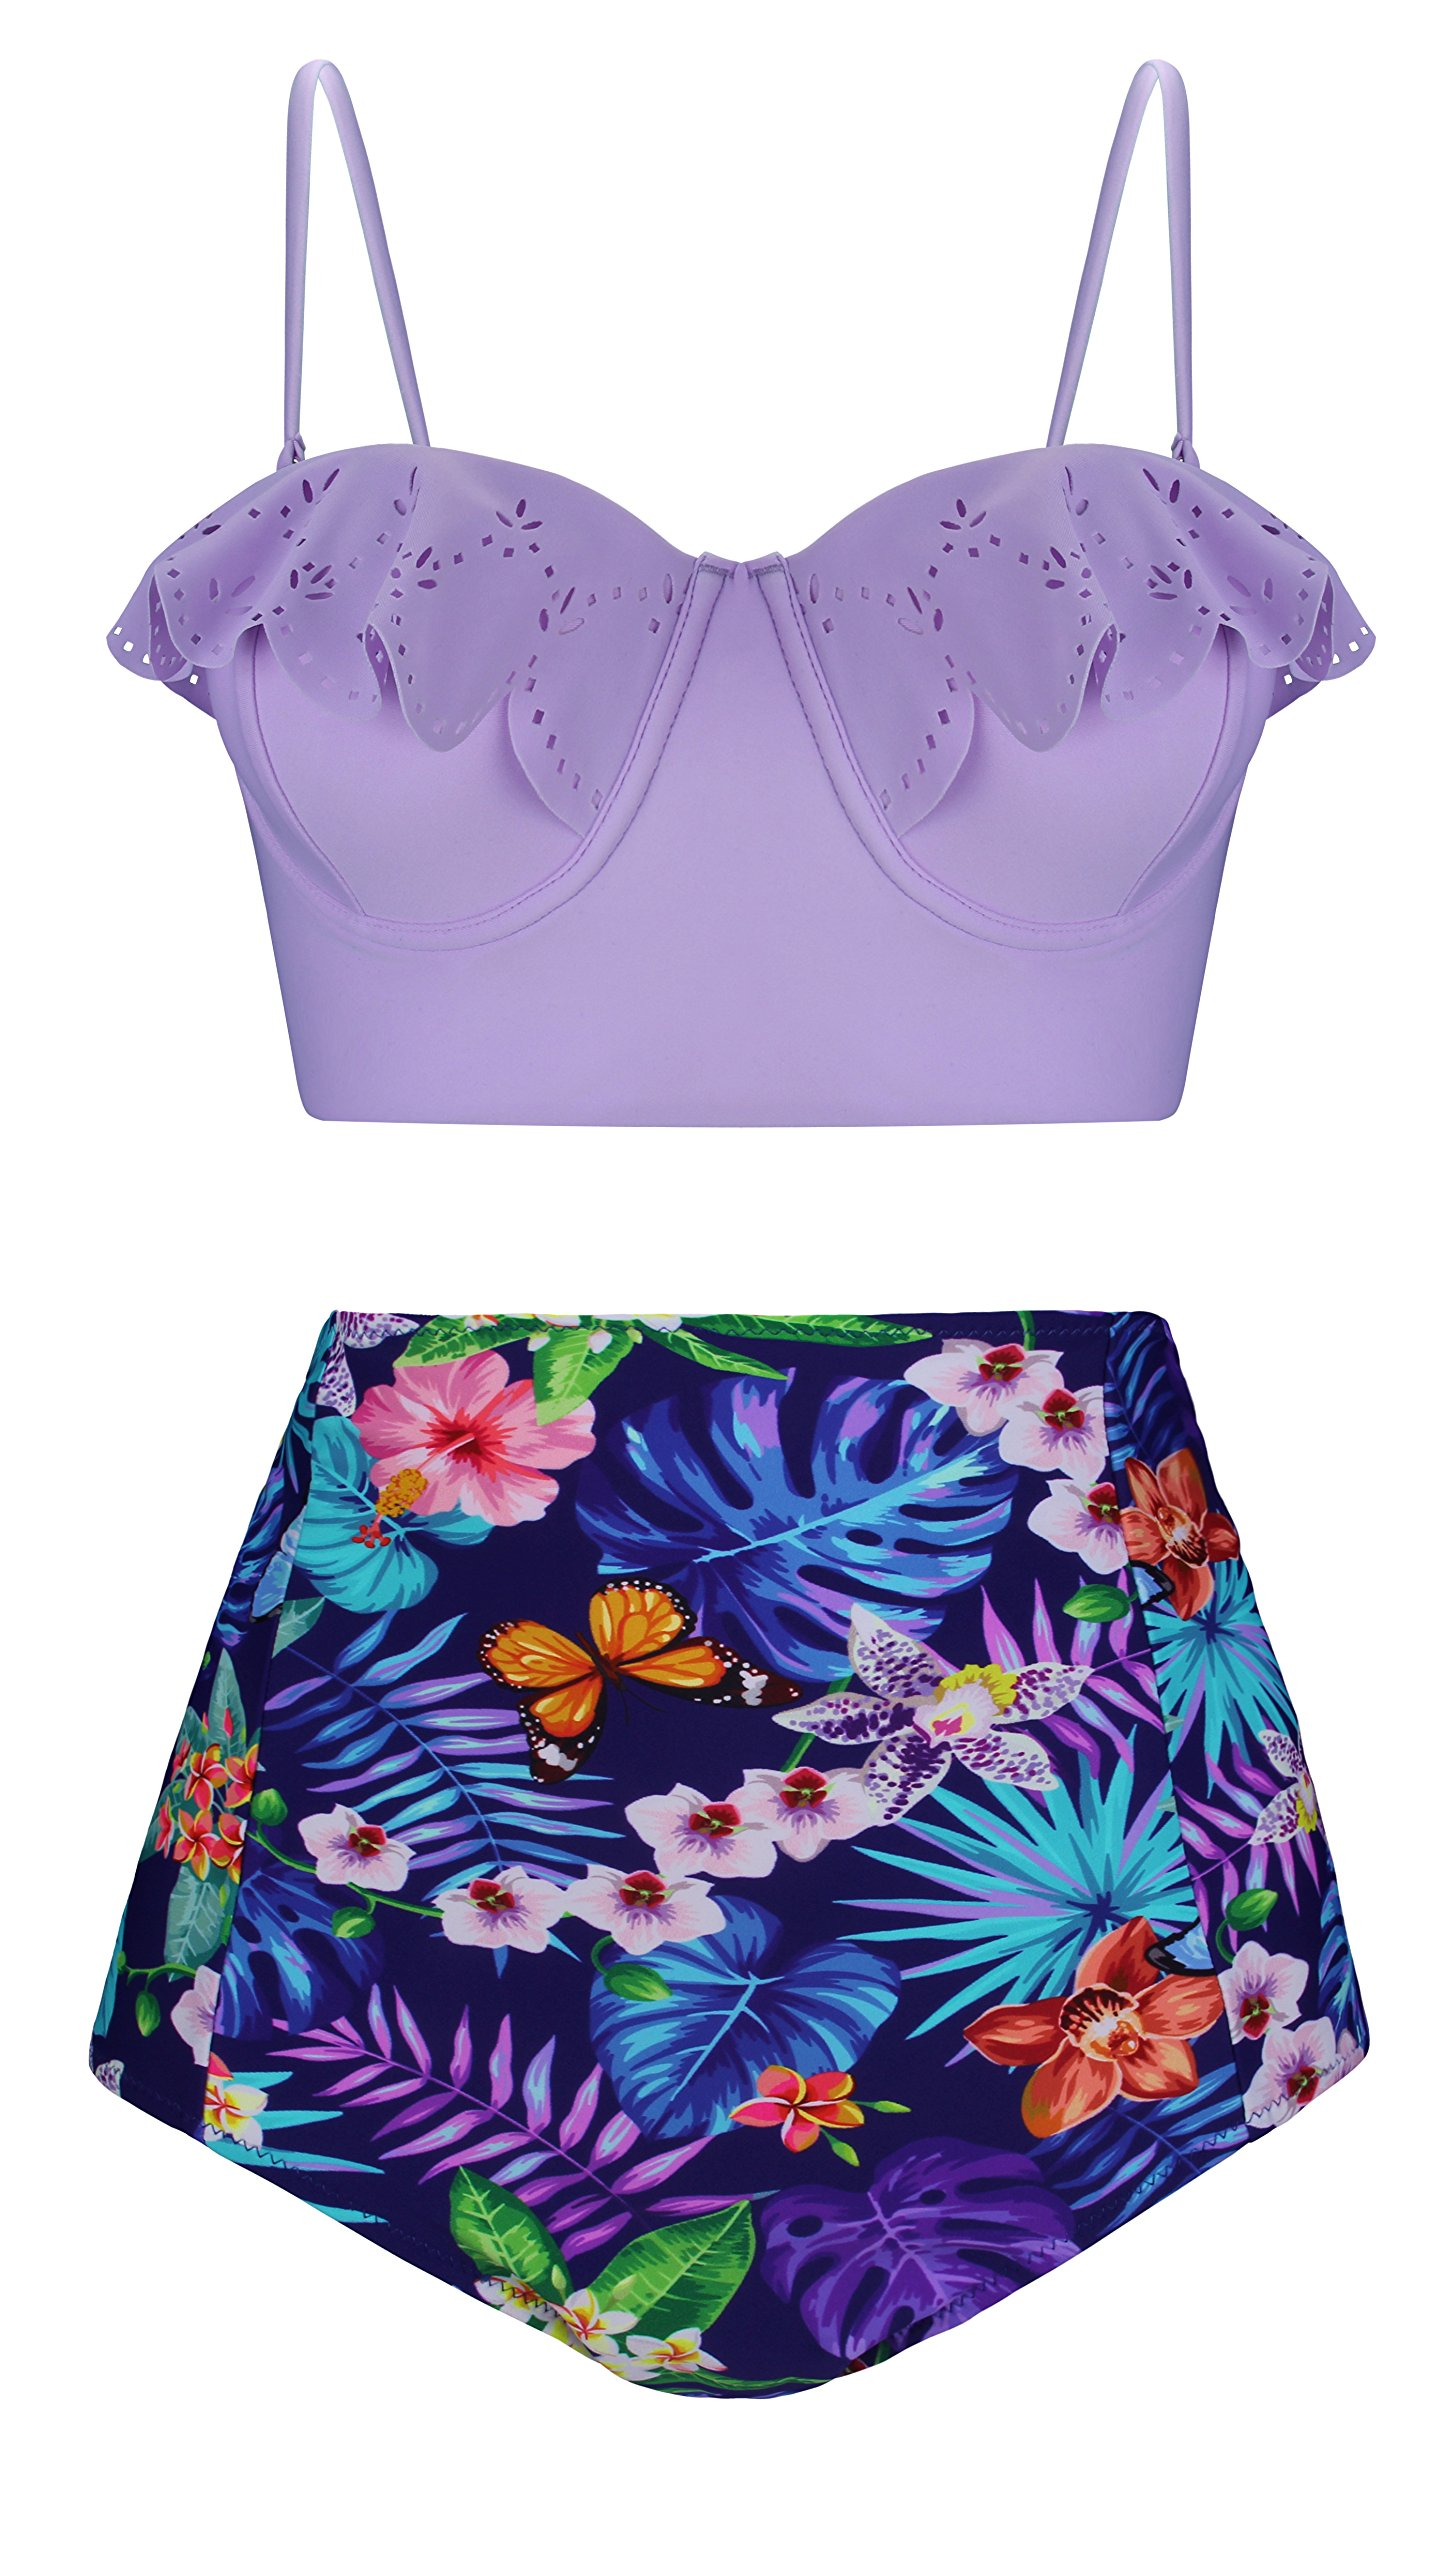 Angerella Ruffled Top Bikini Retro Vintage Style Two Piece Swimsuits High Waisted Bikini Bottom Purple,L